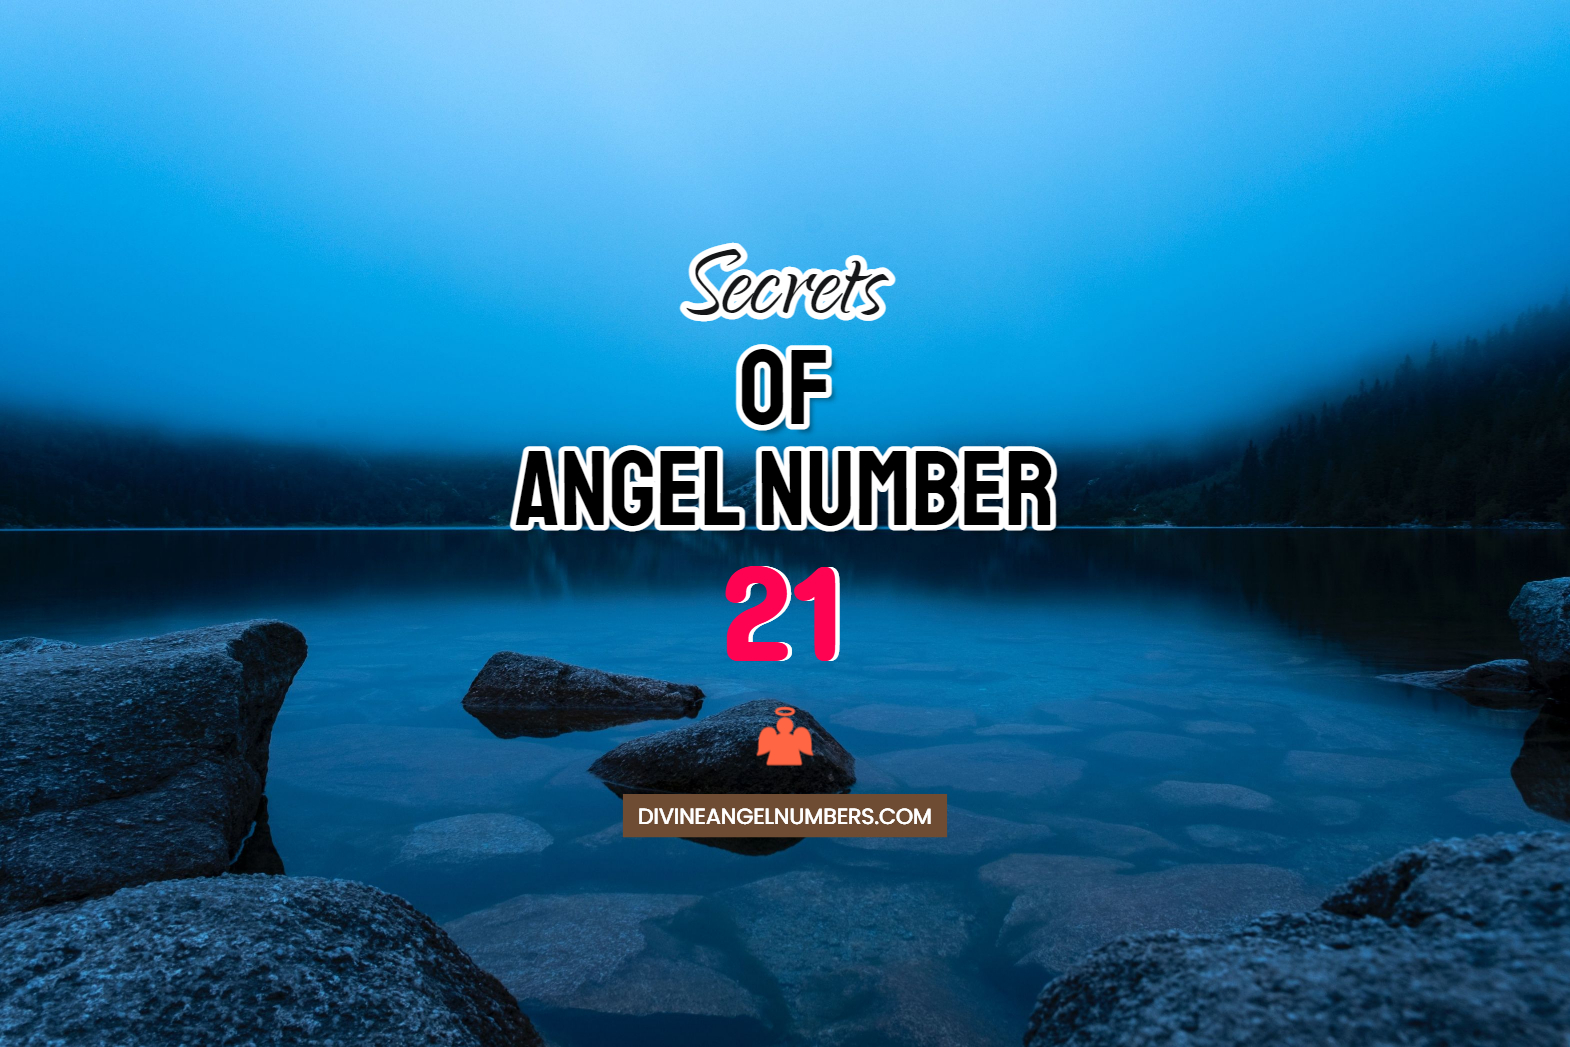 21 Angel Number: Meaning & Symbolism